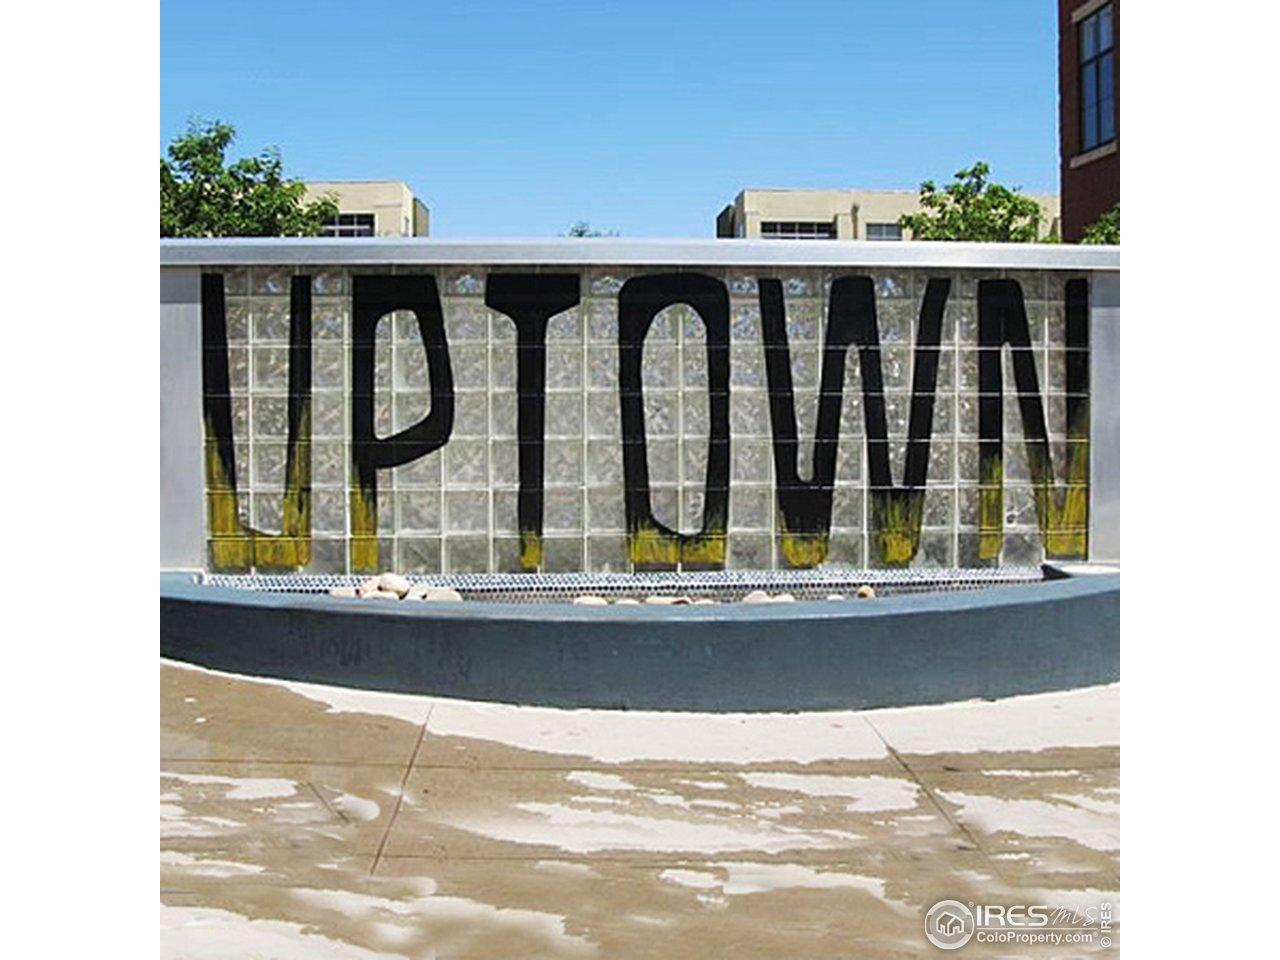 Uptown Broadway